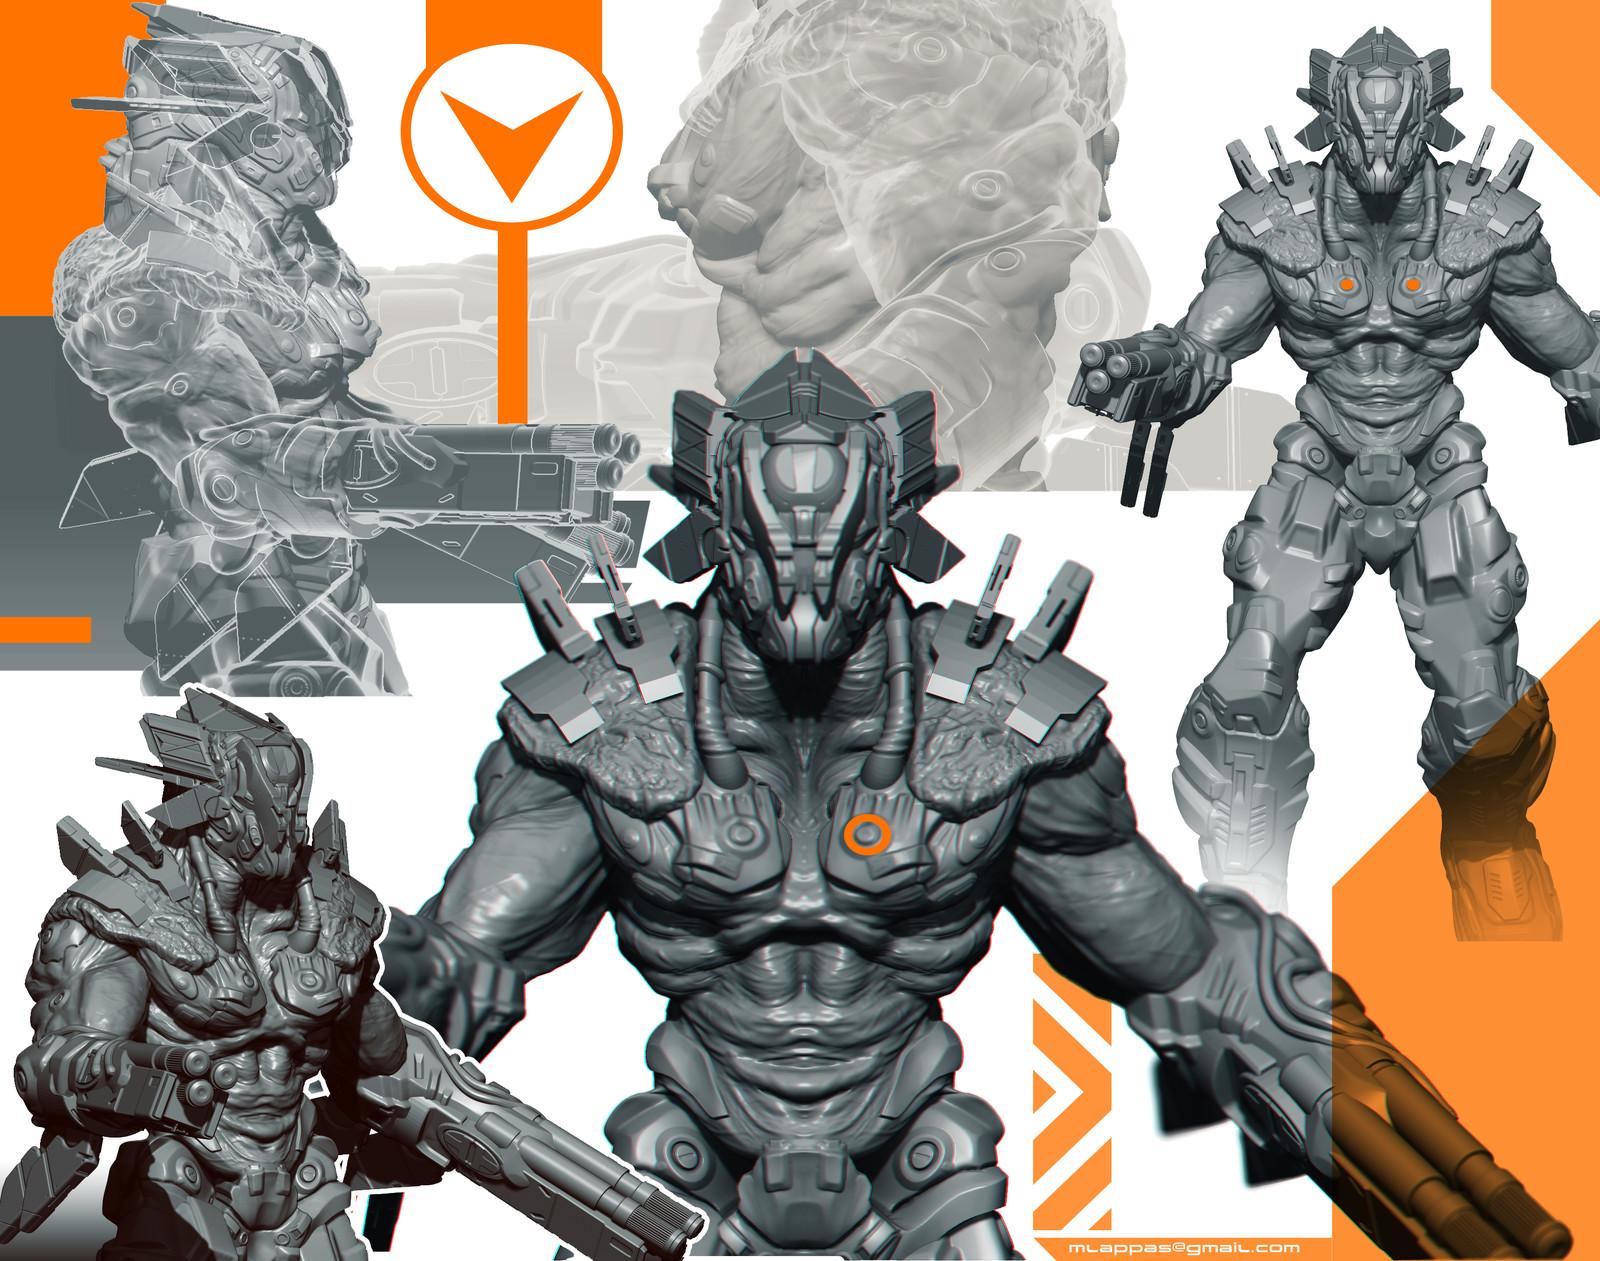 Cyborg Warrior 3D concept